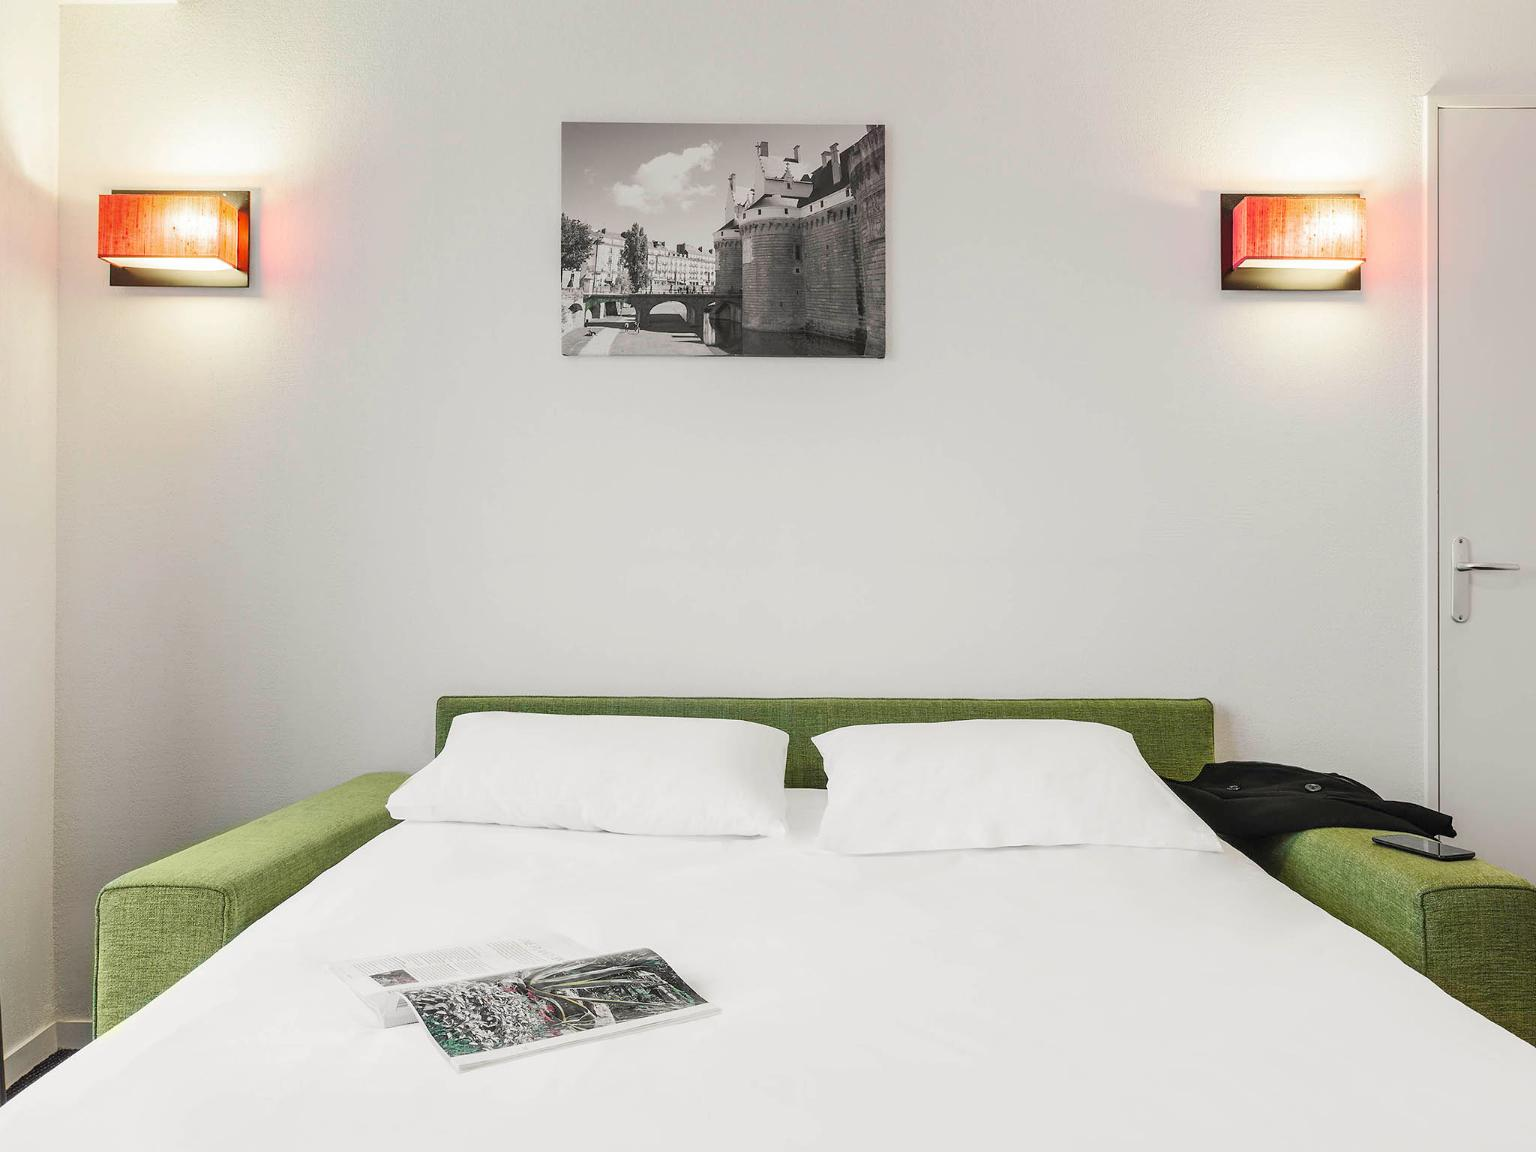 Aparthotel adagio access nantes viarme h tel 42 rue for Aparthotel nantes